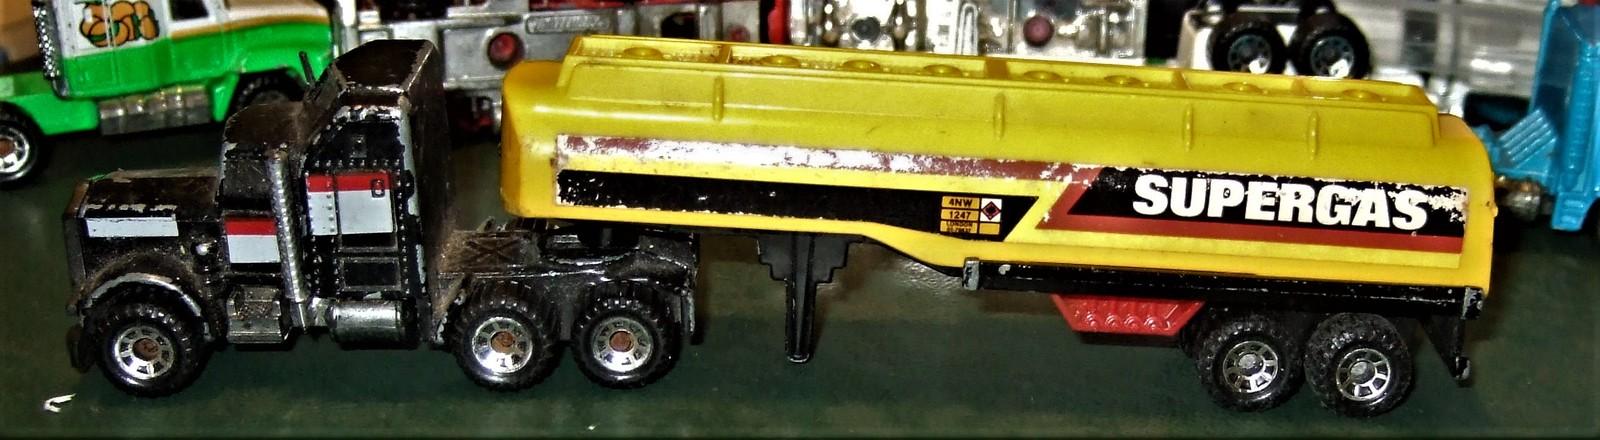 "Matchbox -  Convoy PETERBILT ""SUPERGAS TANKER"" image 2"